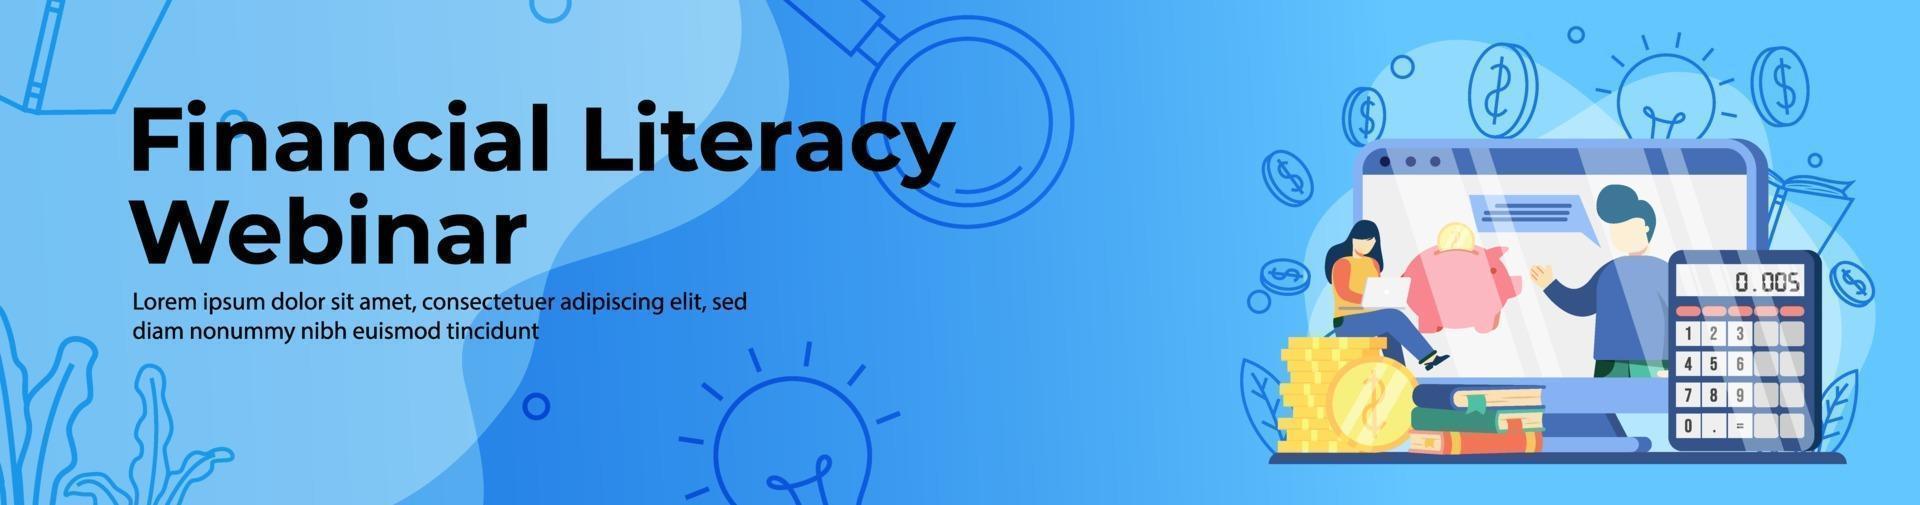 Financial Literacy Webinar Web Banner Design vector